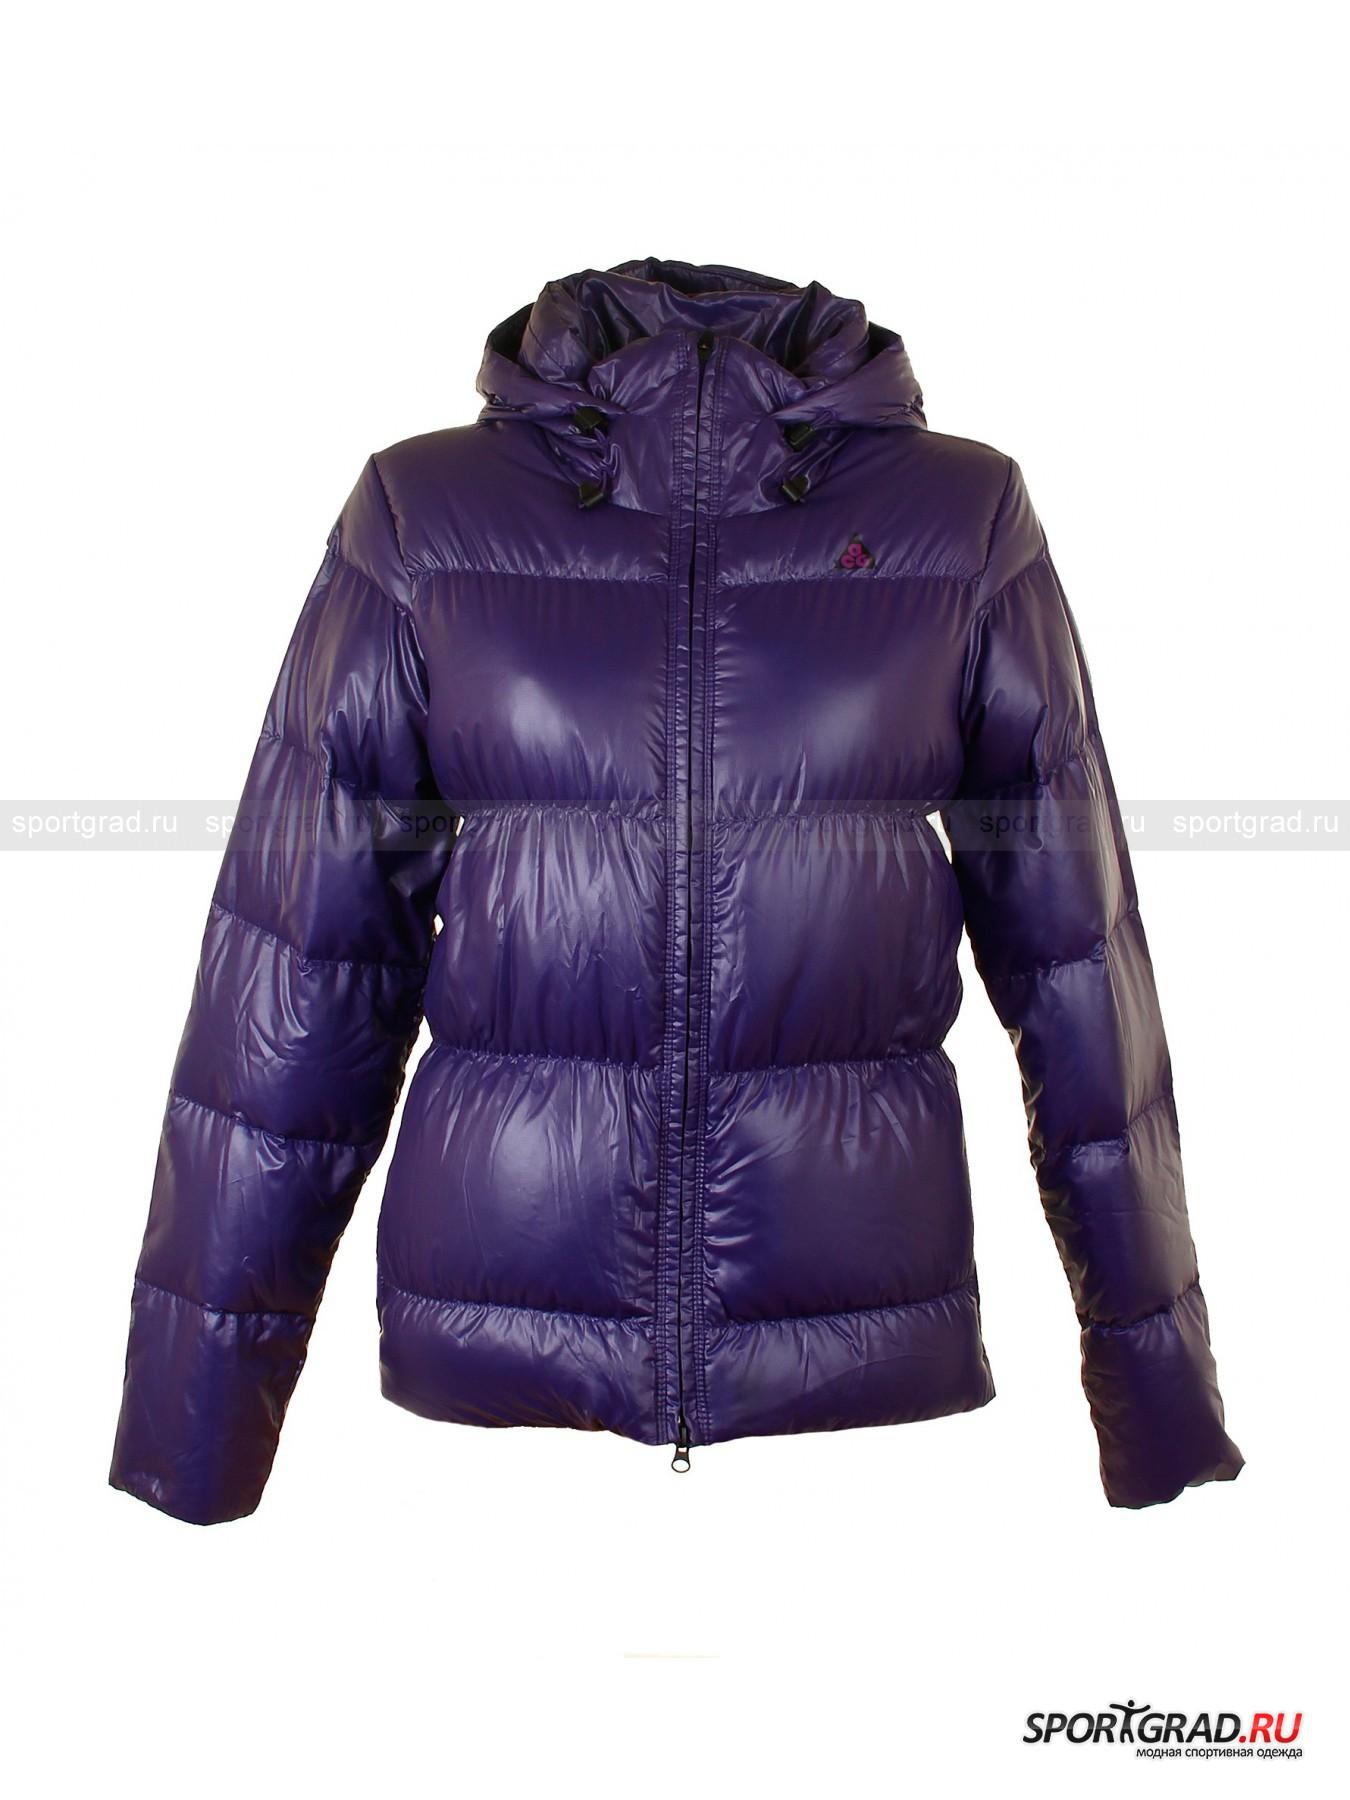 Куртка женская Lava Flow 800 Jacket NIKE от Спортград